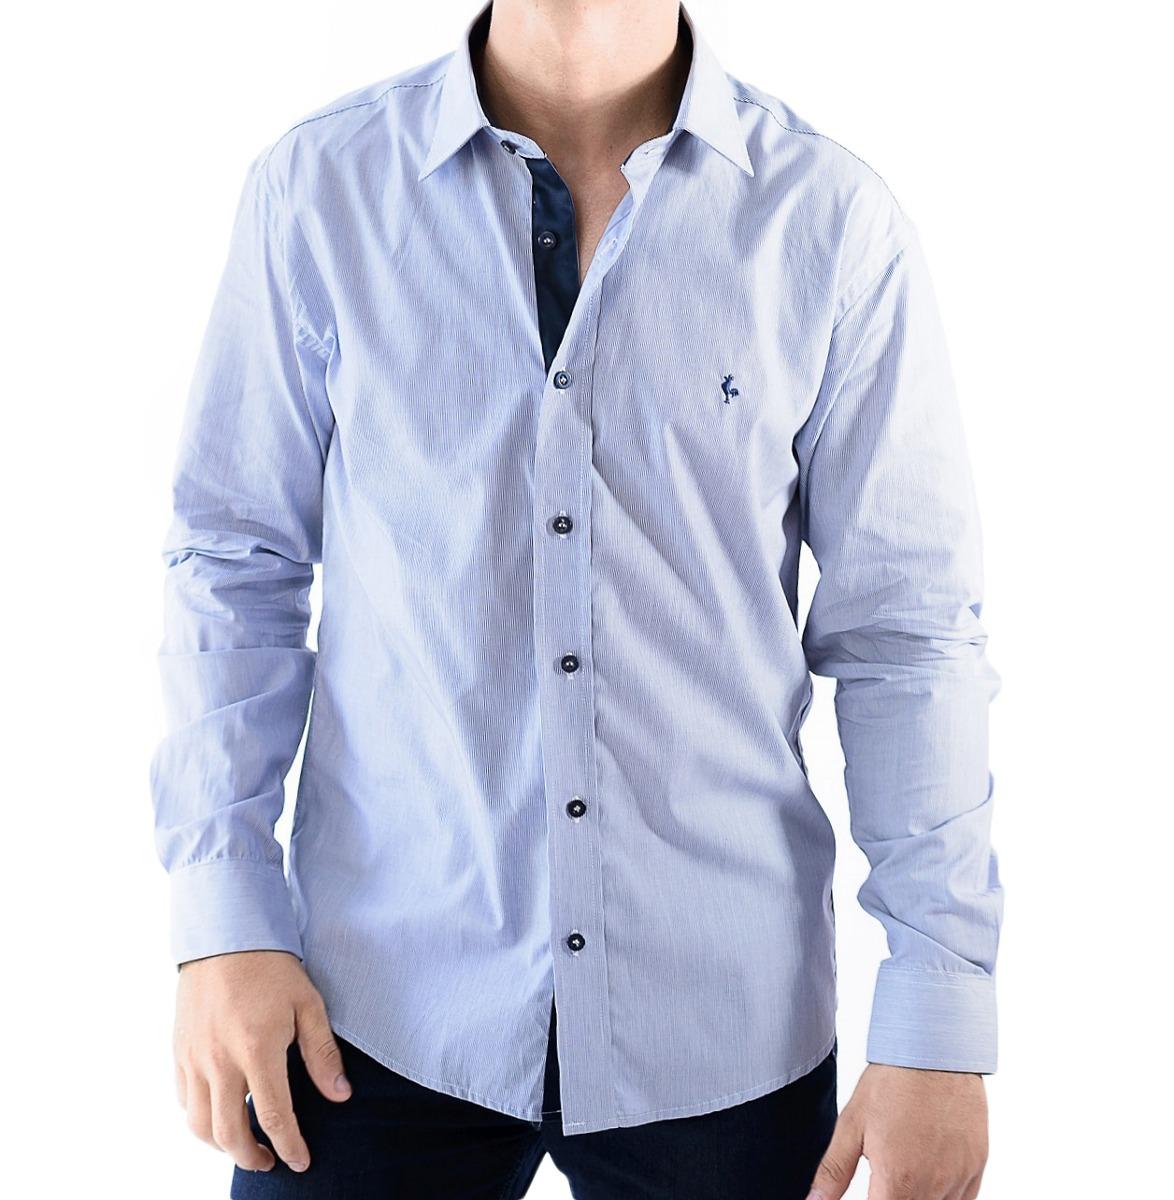 camisa zimpool social slim fit manga longa azul blue collect. Carregando  zoom. 5d70516961abf